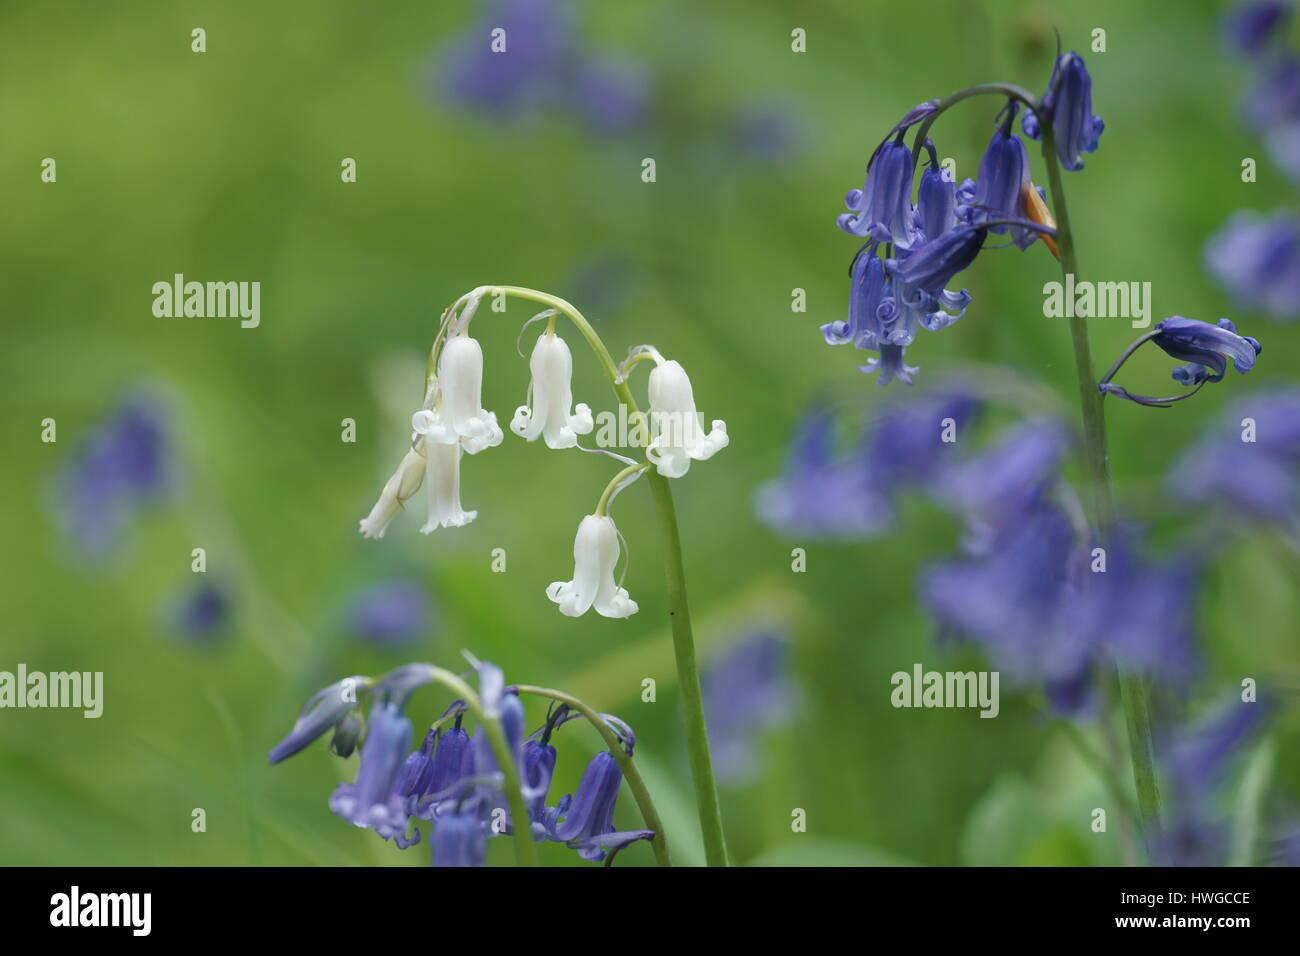 Hyacinthoides non-scripta (alba form) - Stock Image